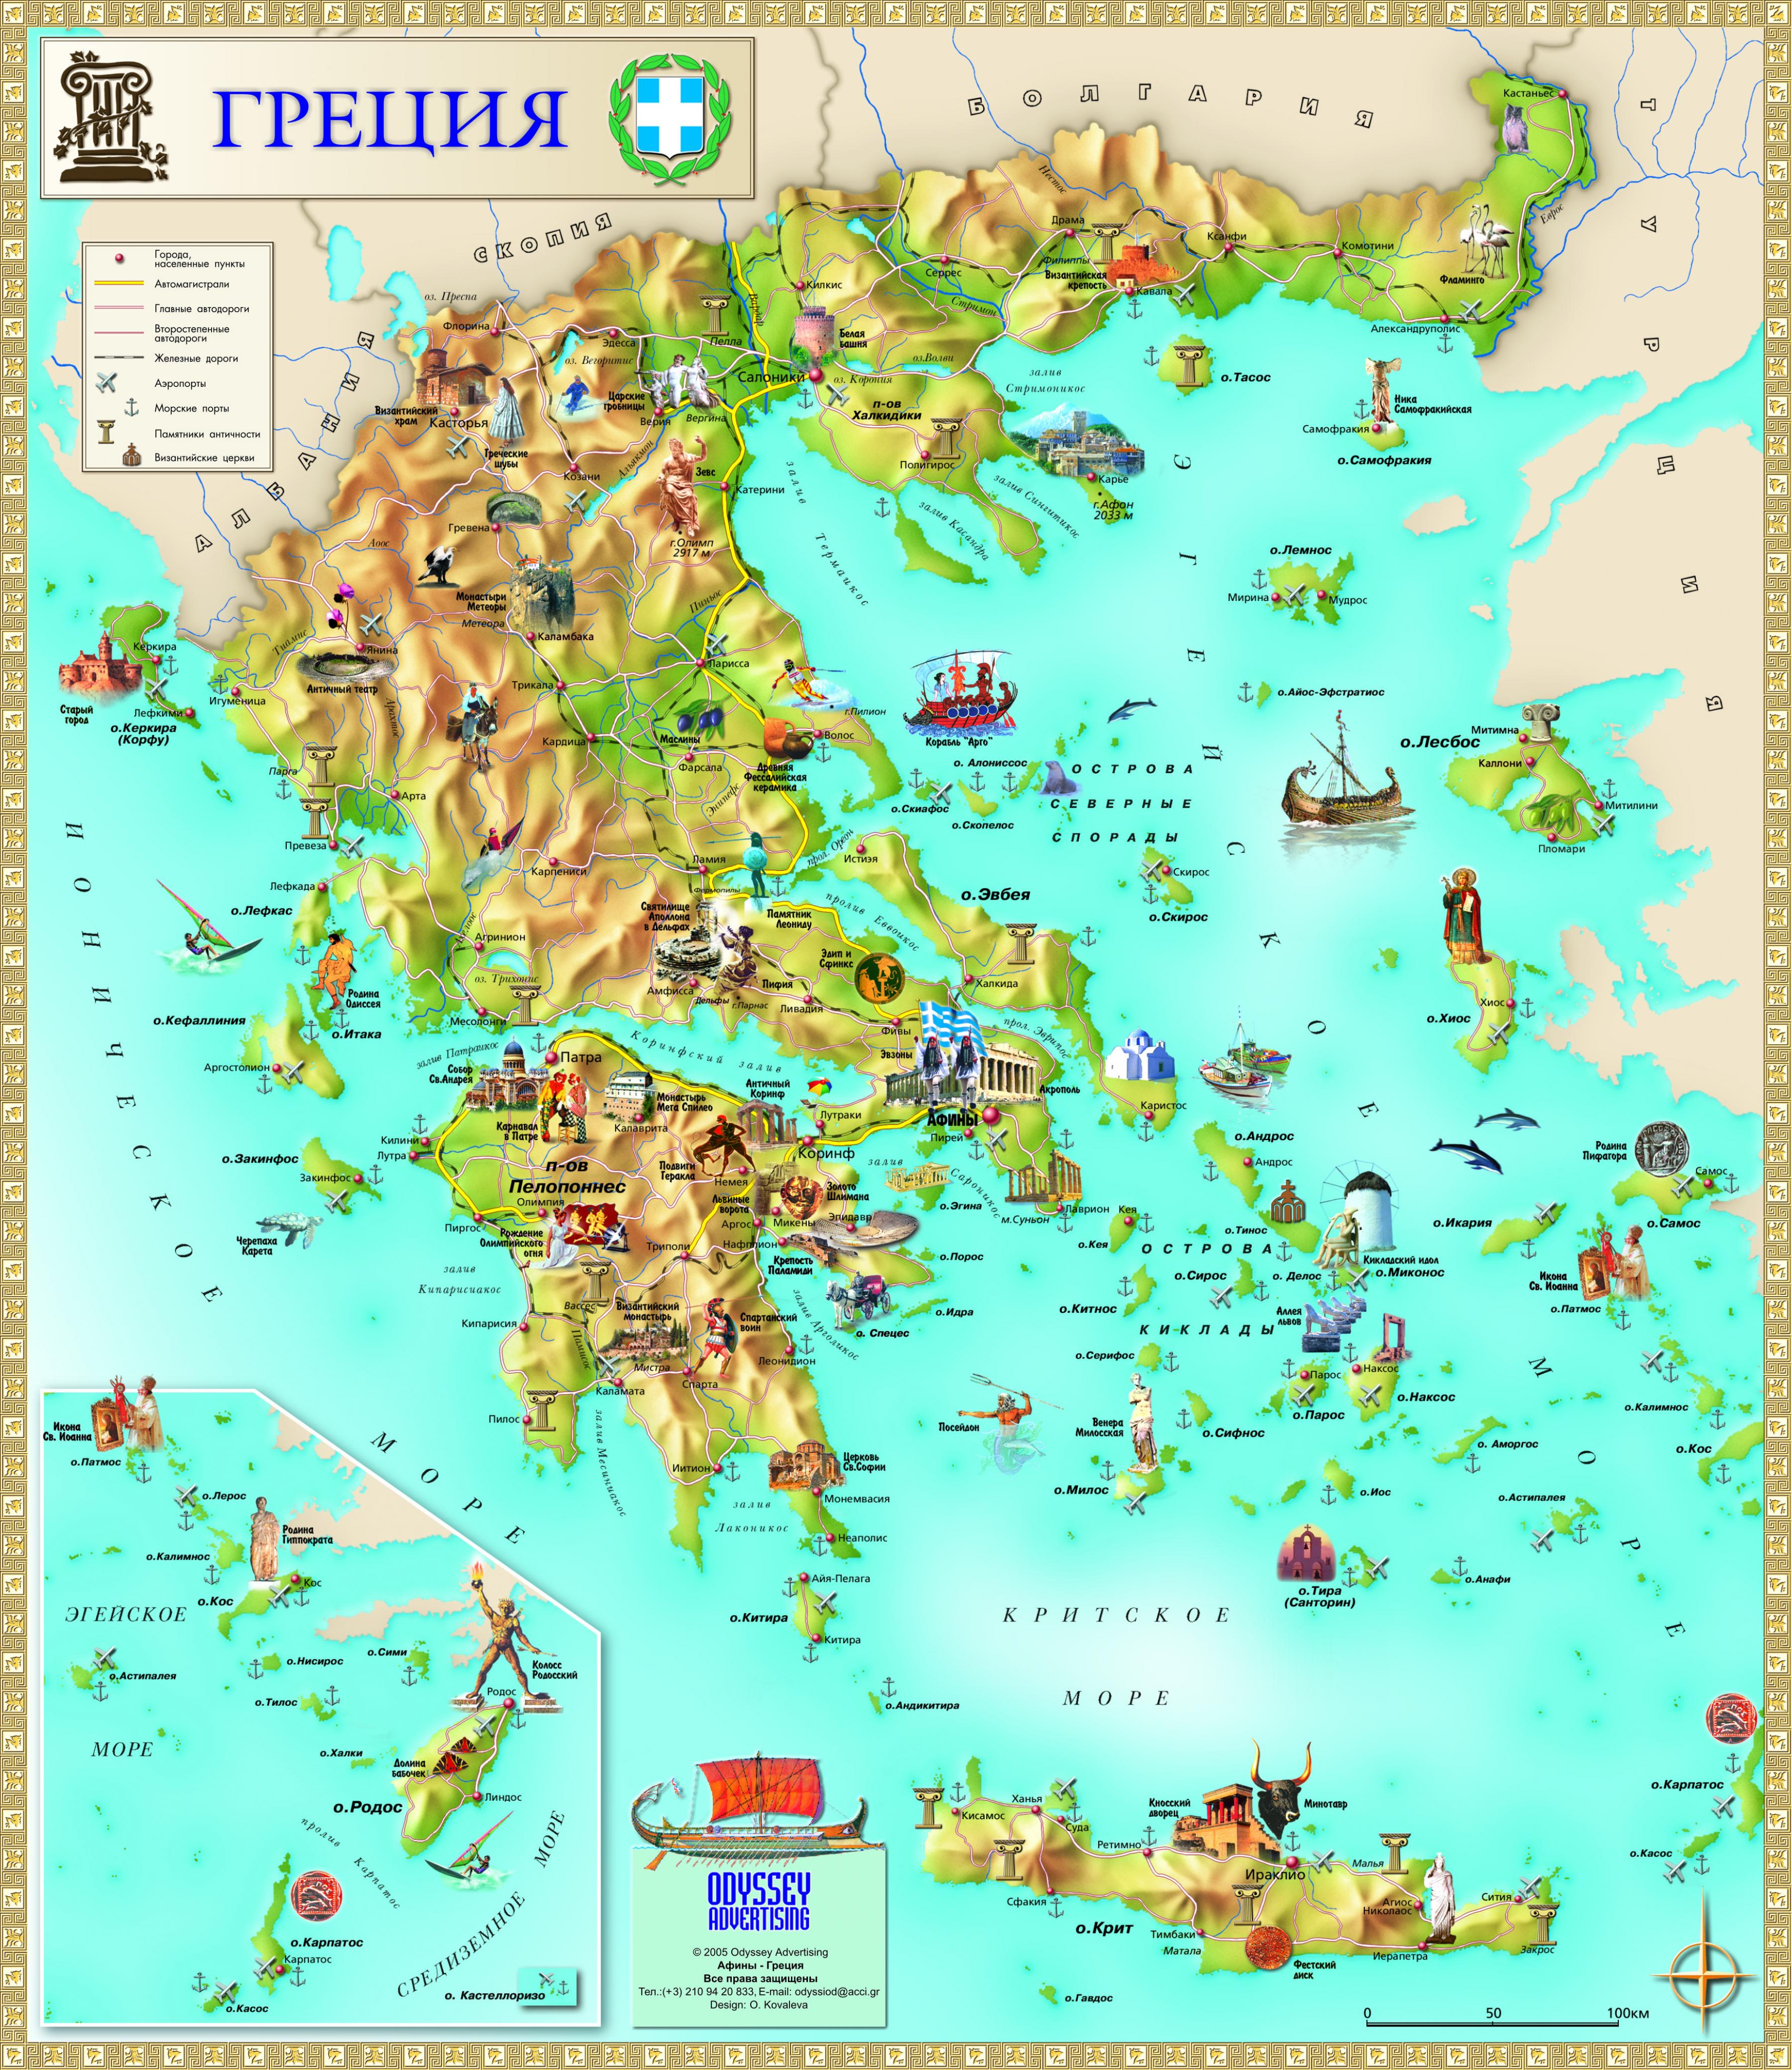 Grecia Obiective Turistice Harta Grecia Harta Atractii Turistice